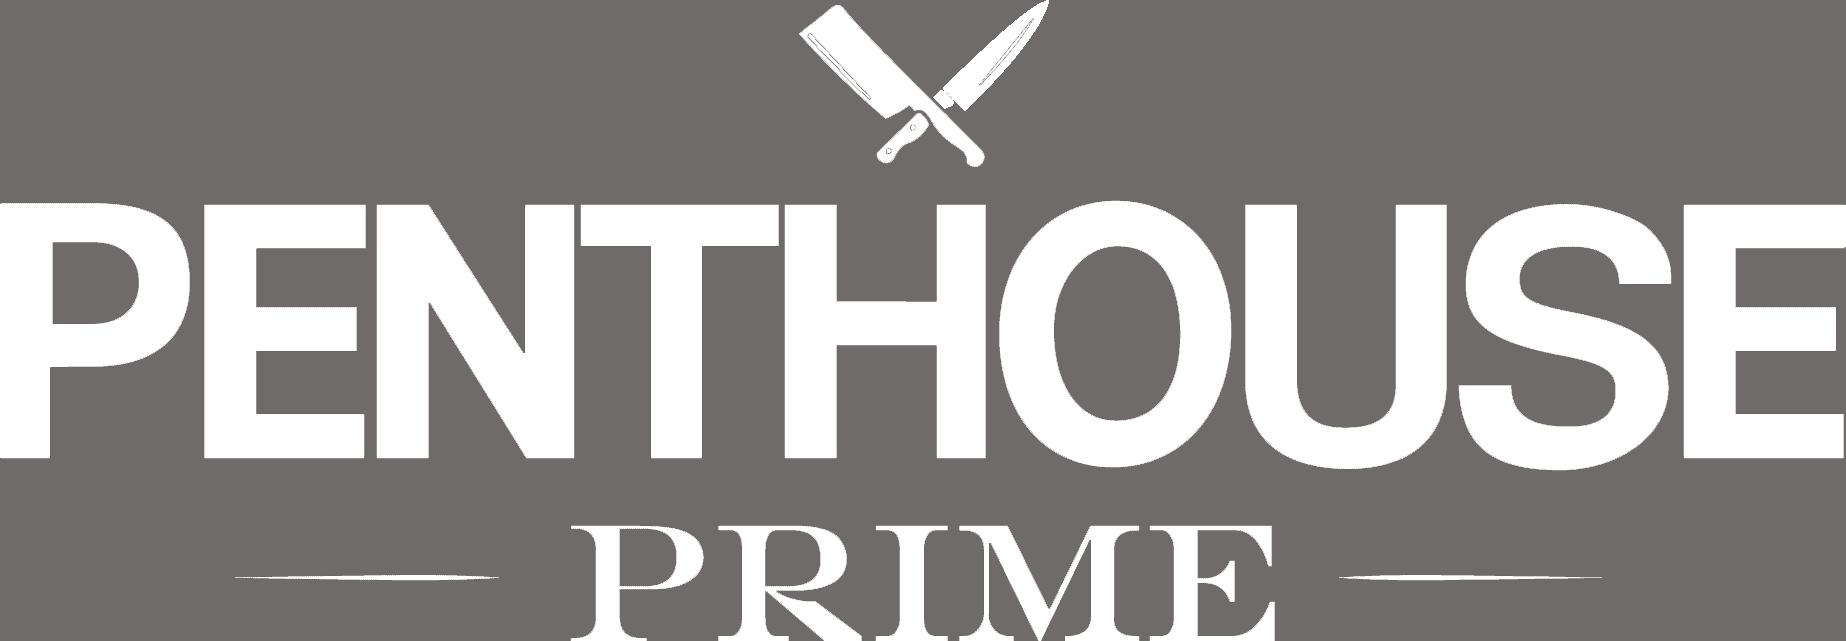 Penthouse_Prime_Allblack